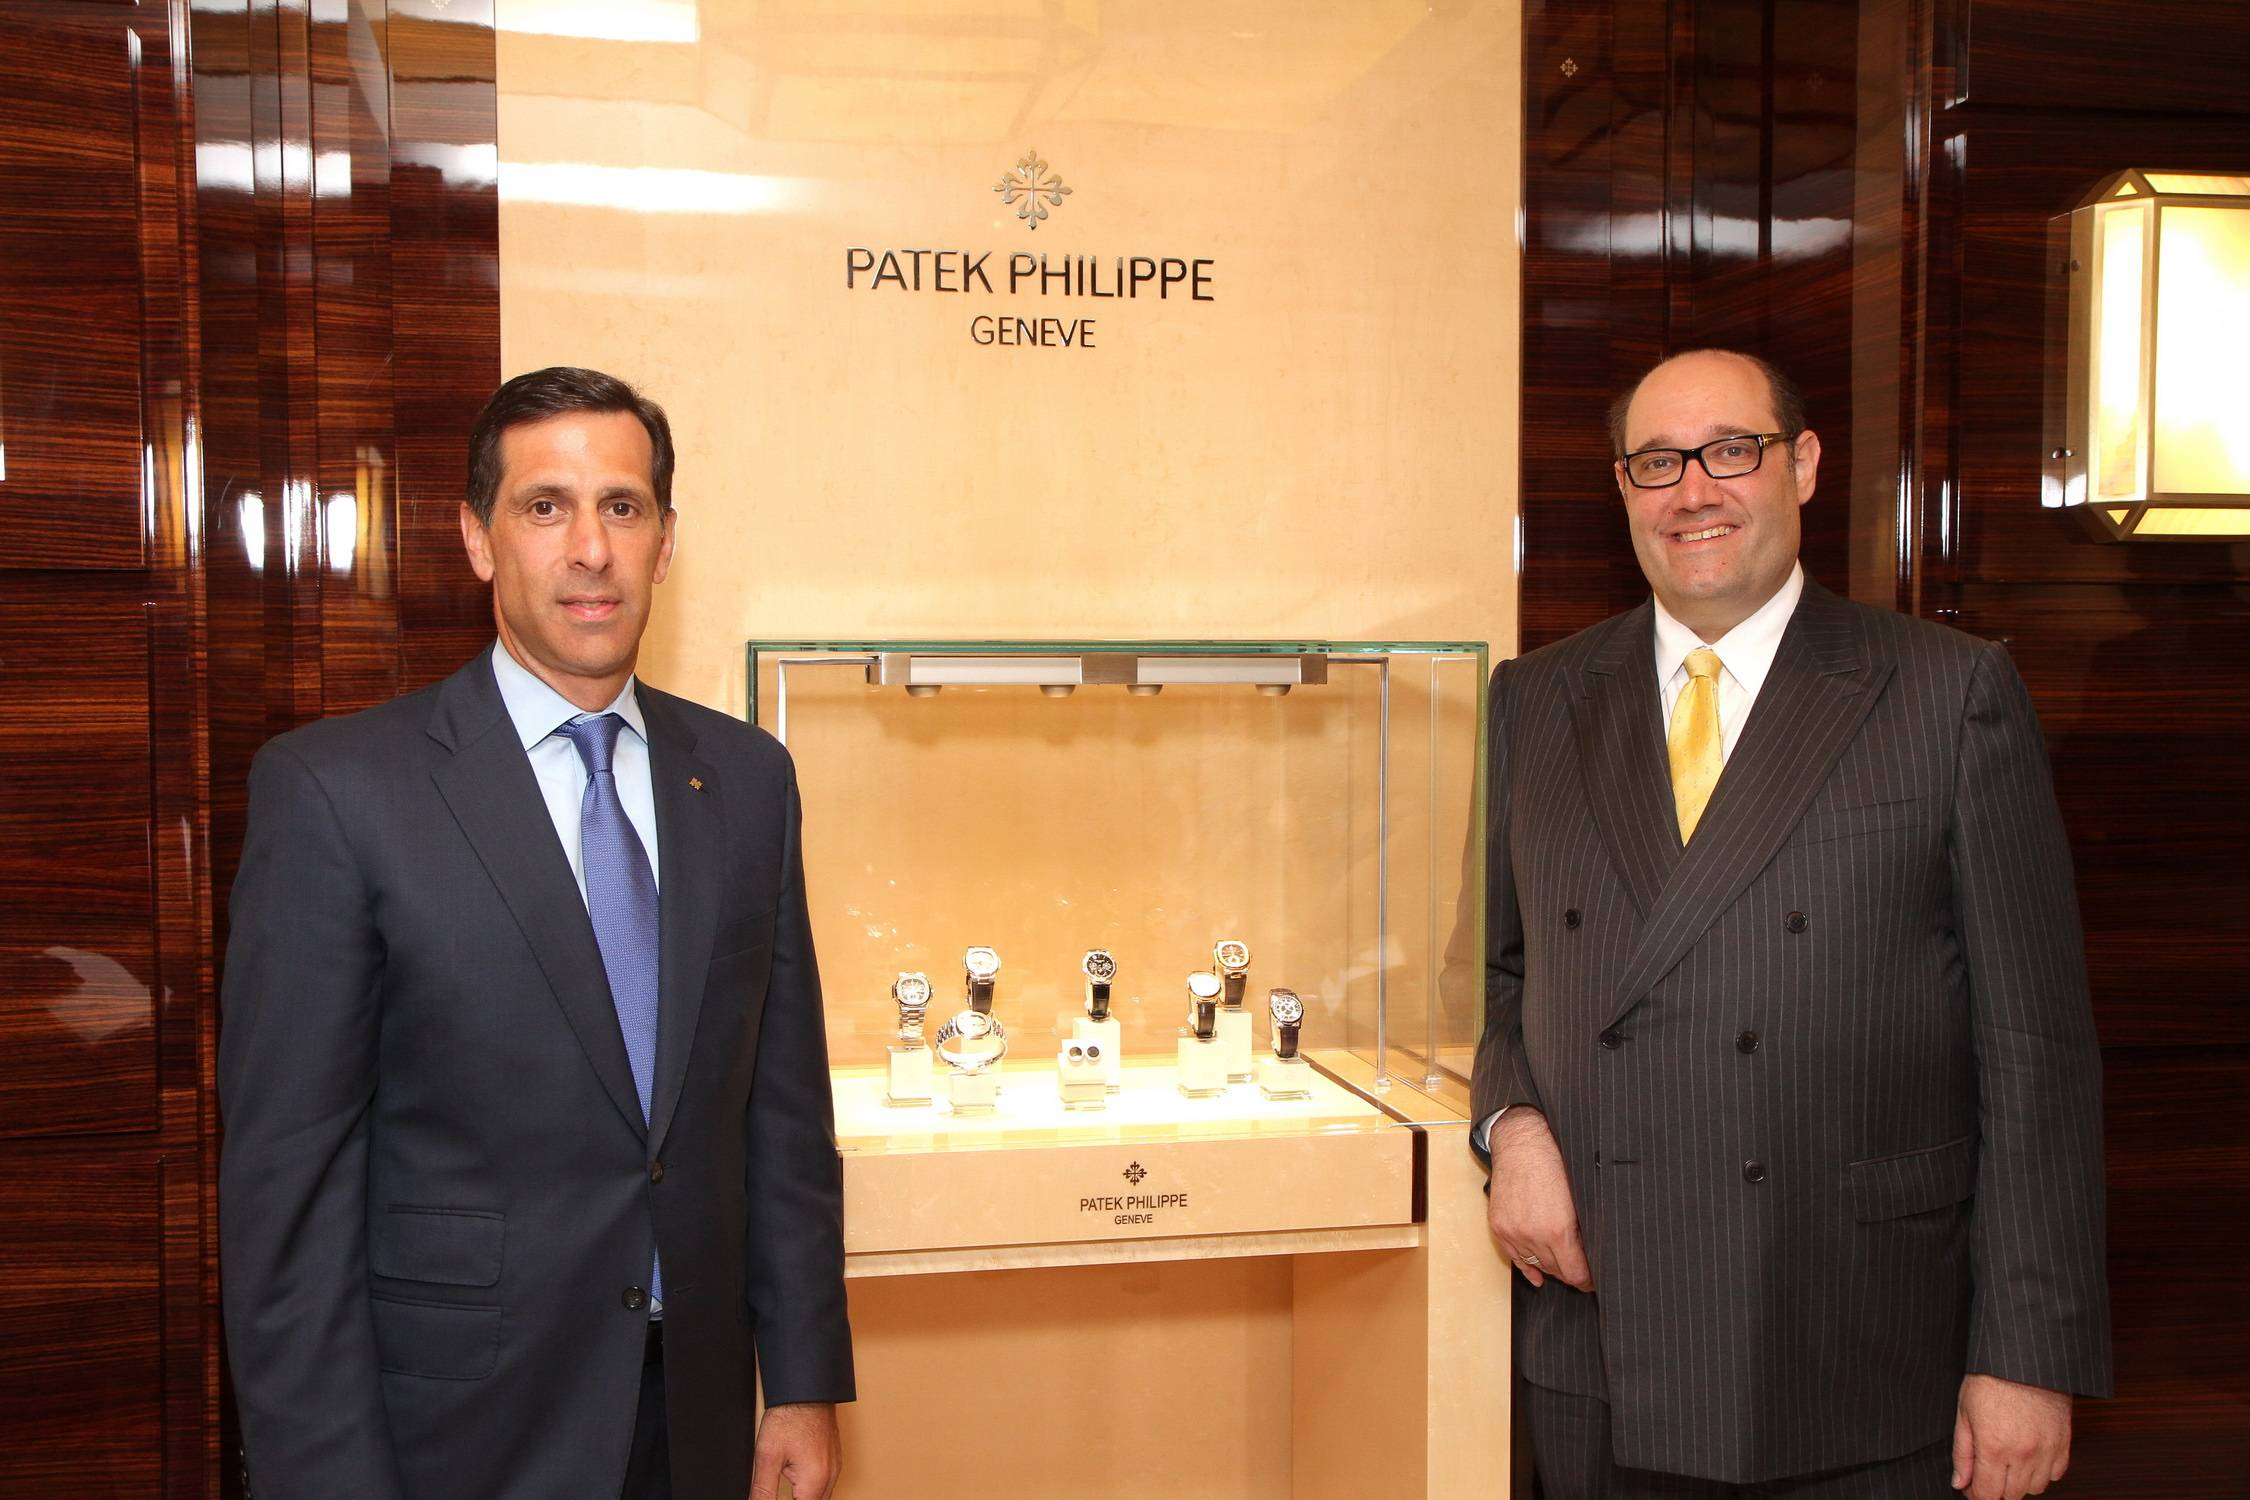 Larry Pettinelli + Tom Blumenthal Patek Philippe